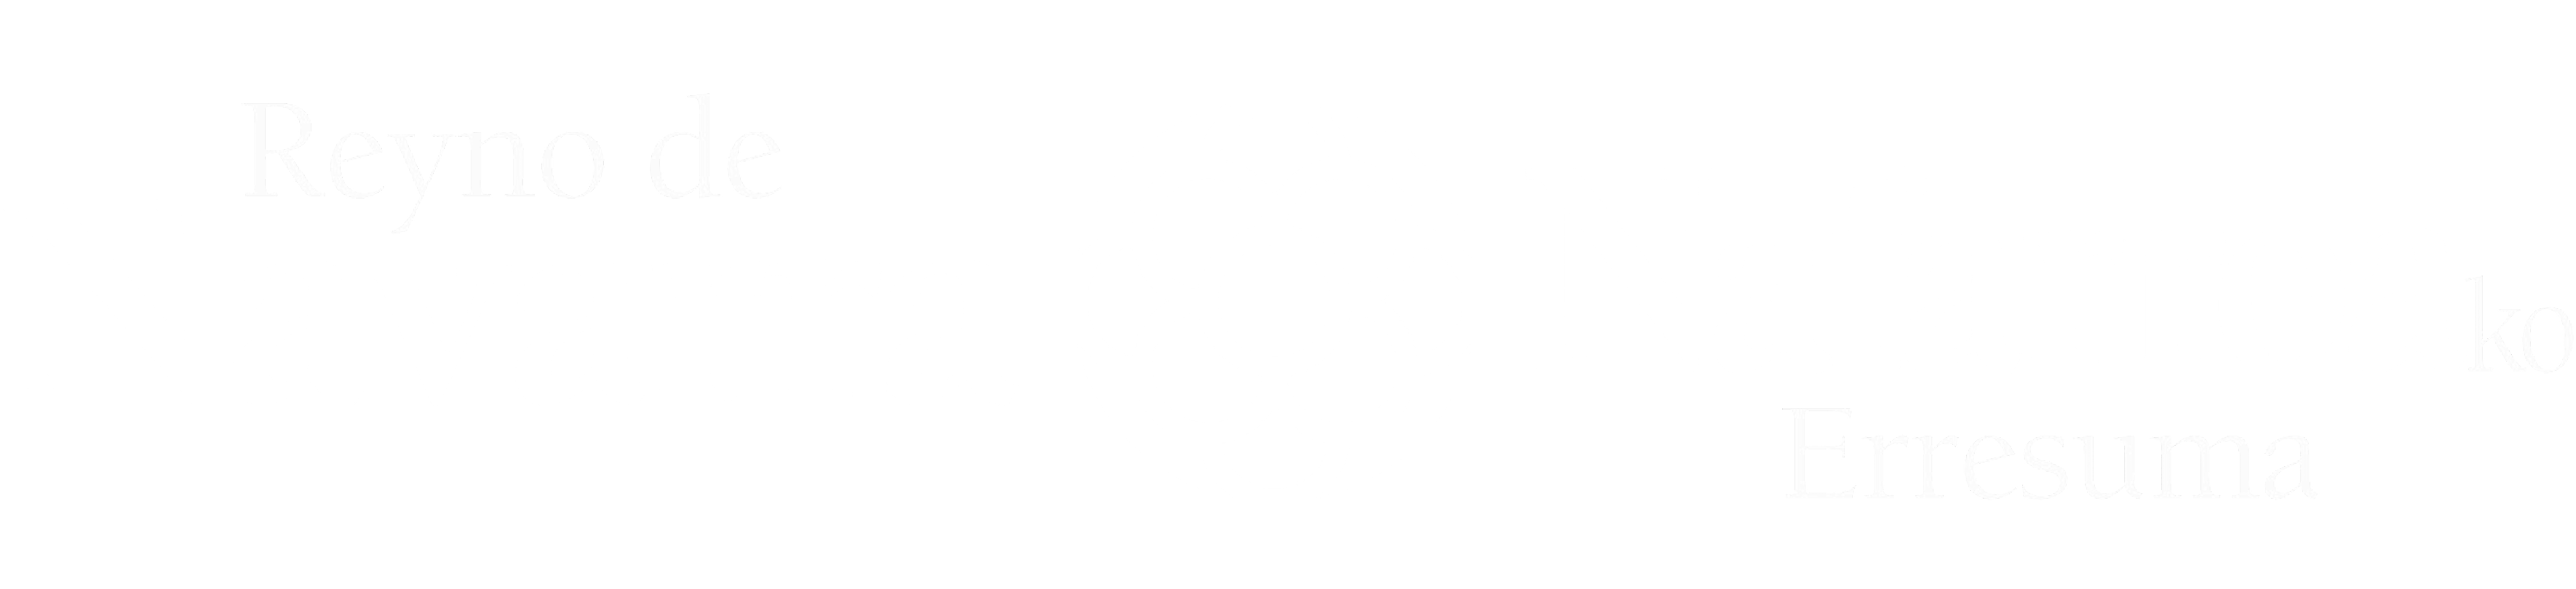 reino de navarra turismo